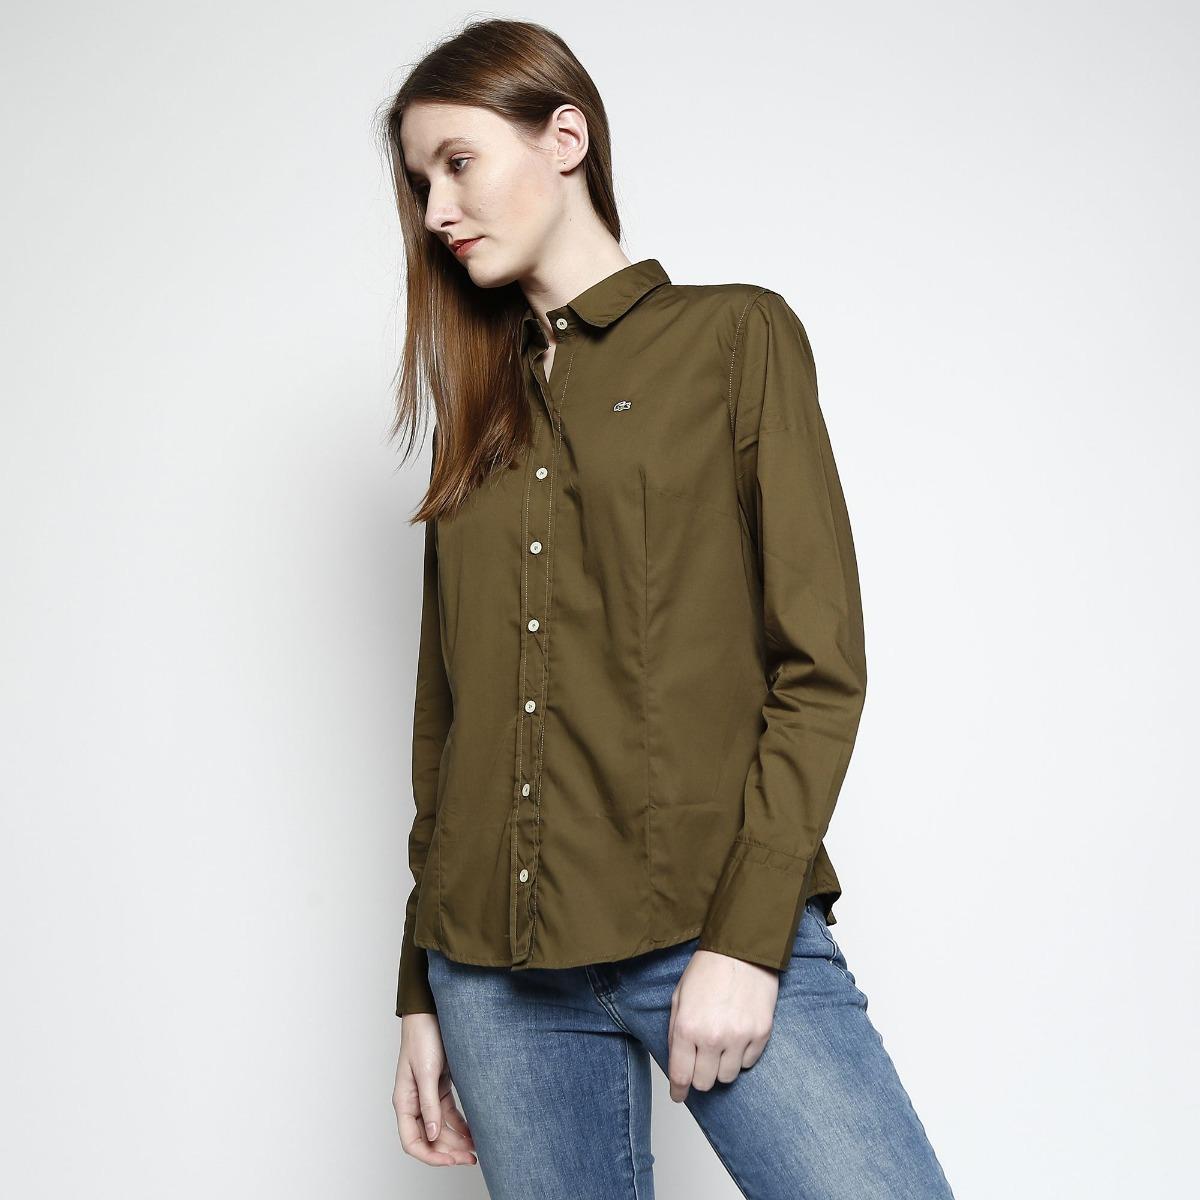 050a8b0b220 camisa social lacoste feminina slim bordado - verde militar. Carregando  zoom.